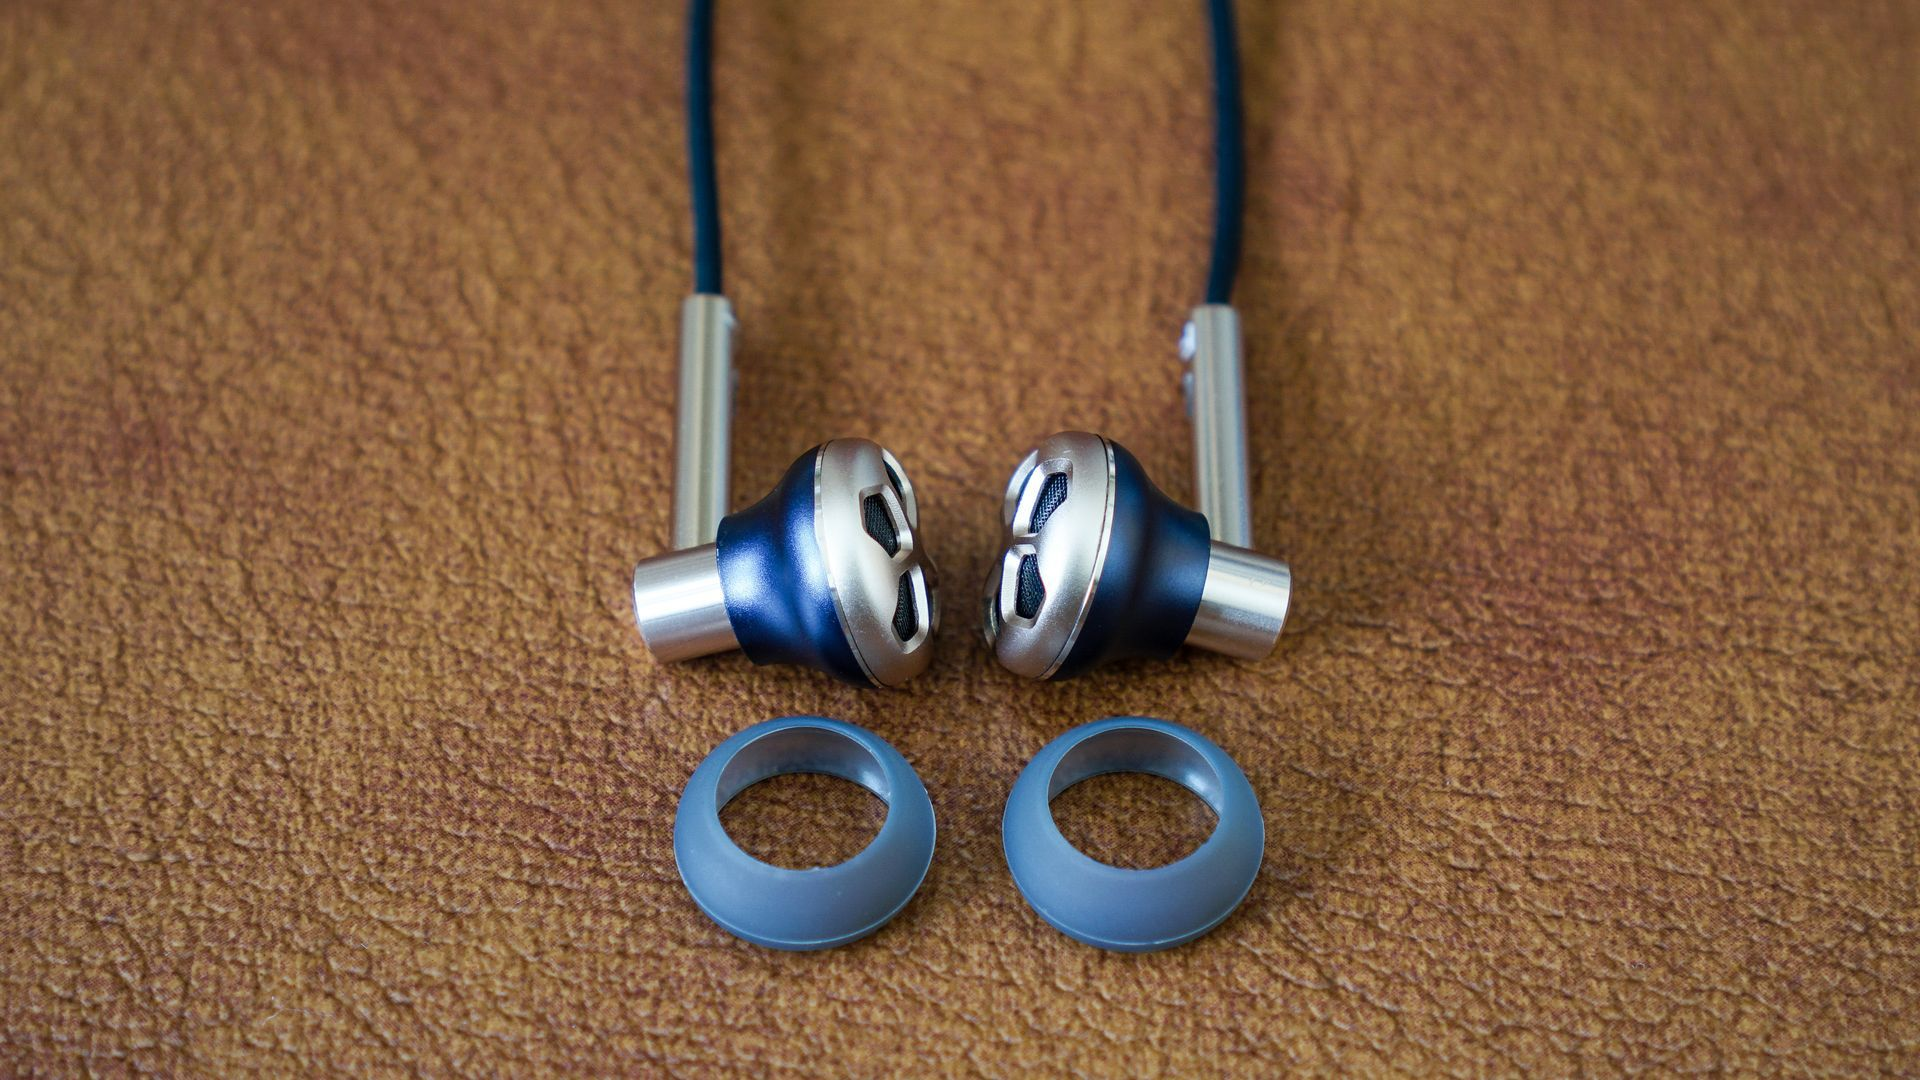 Earphones over ear sony - earbud covers for running